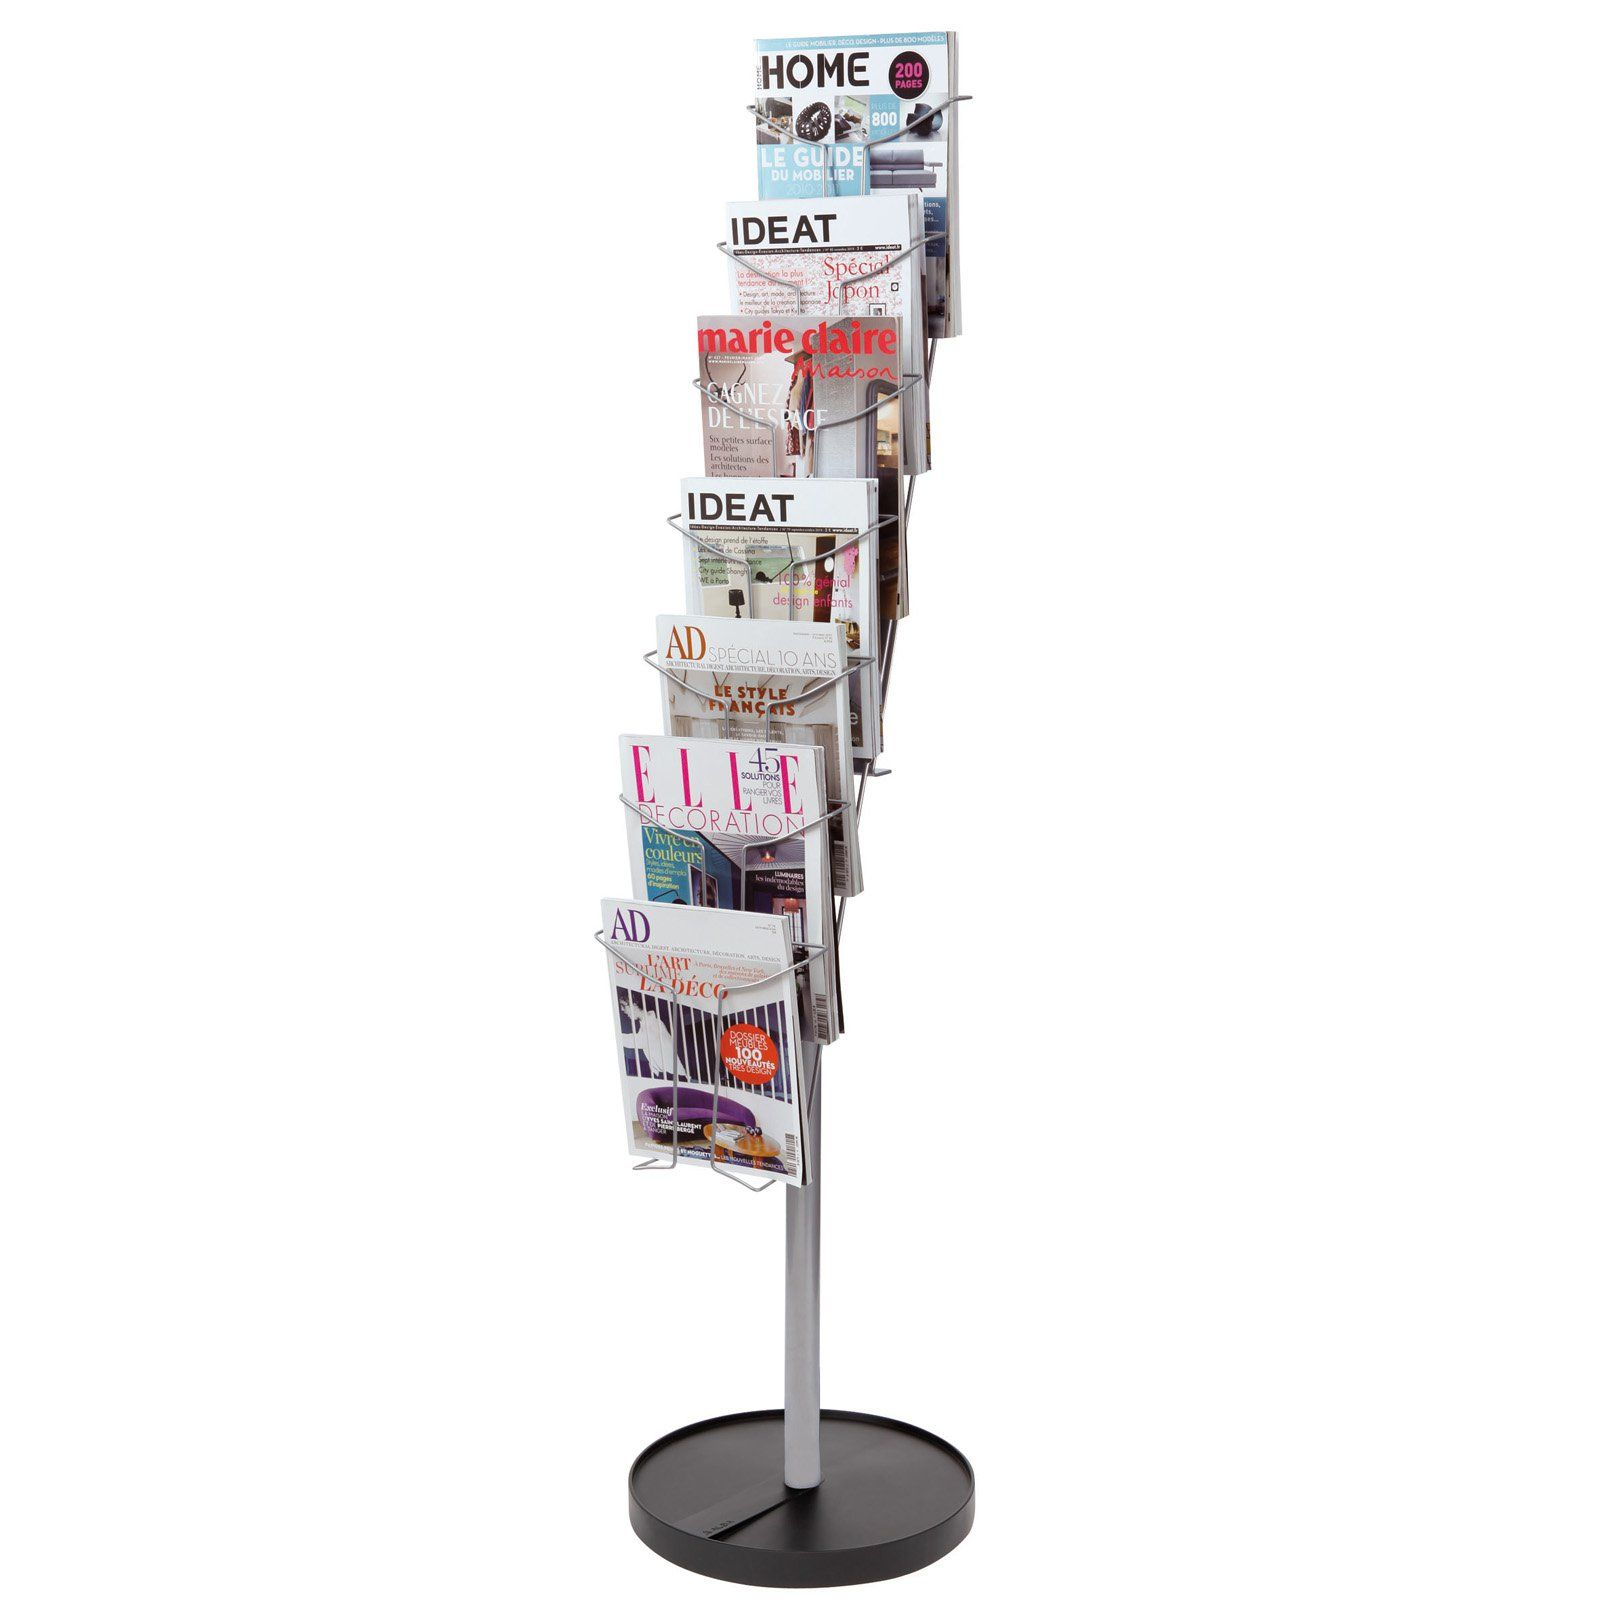 Alba 7 Compartment Wire Floor Literature Display Stand Display Stand Flooring Display